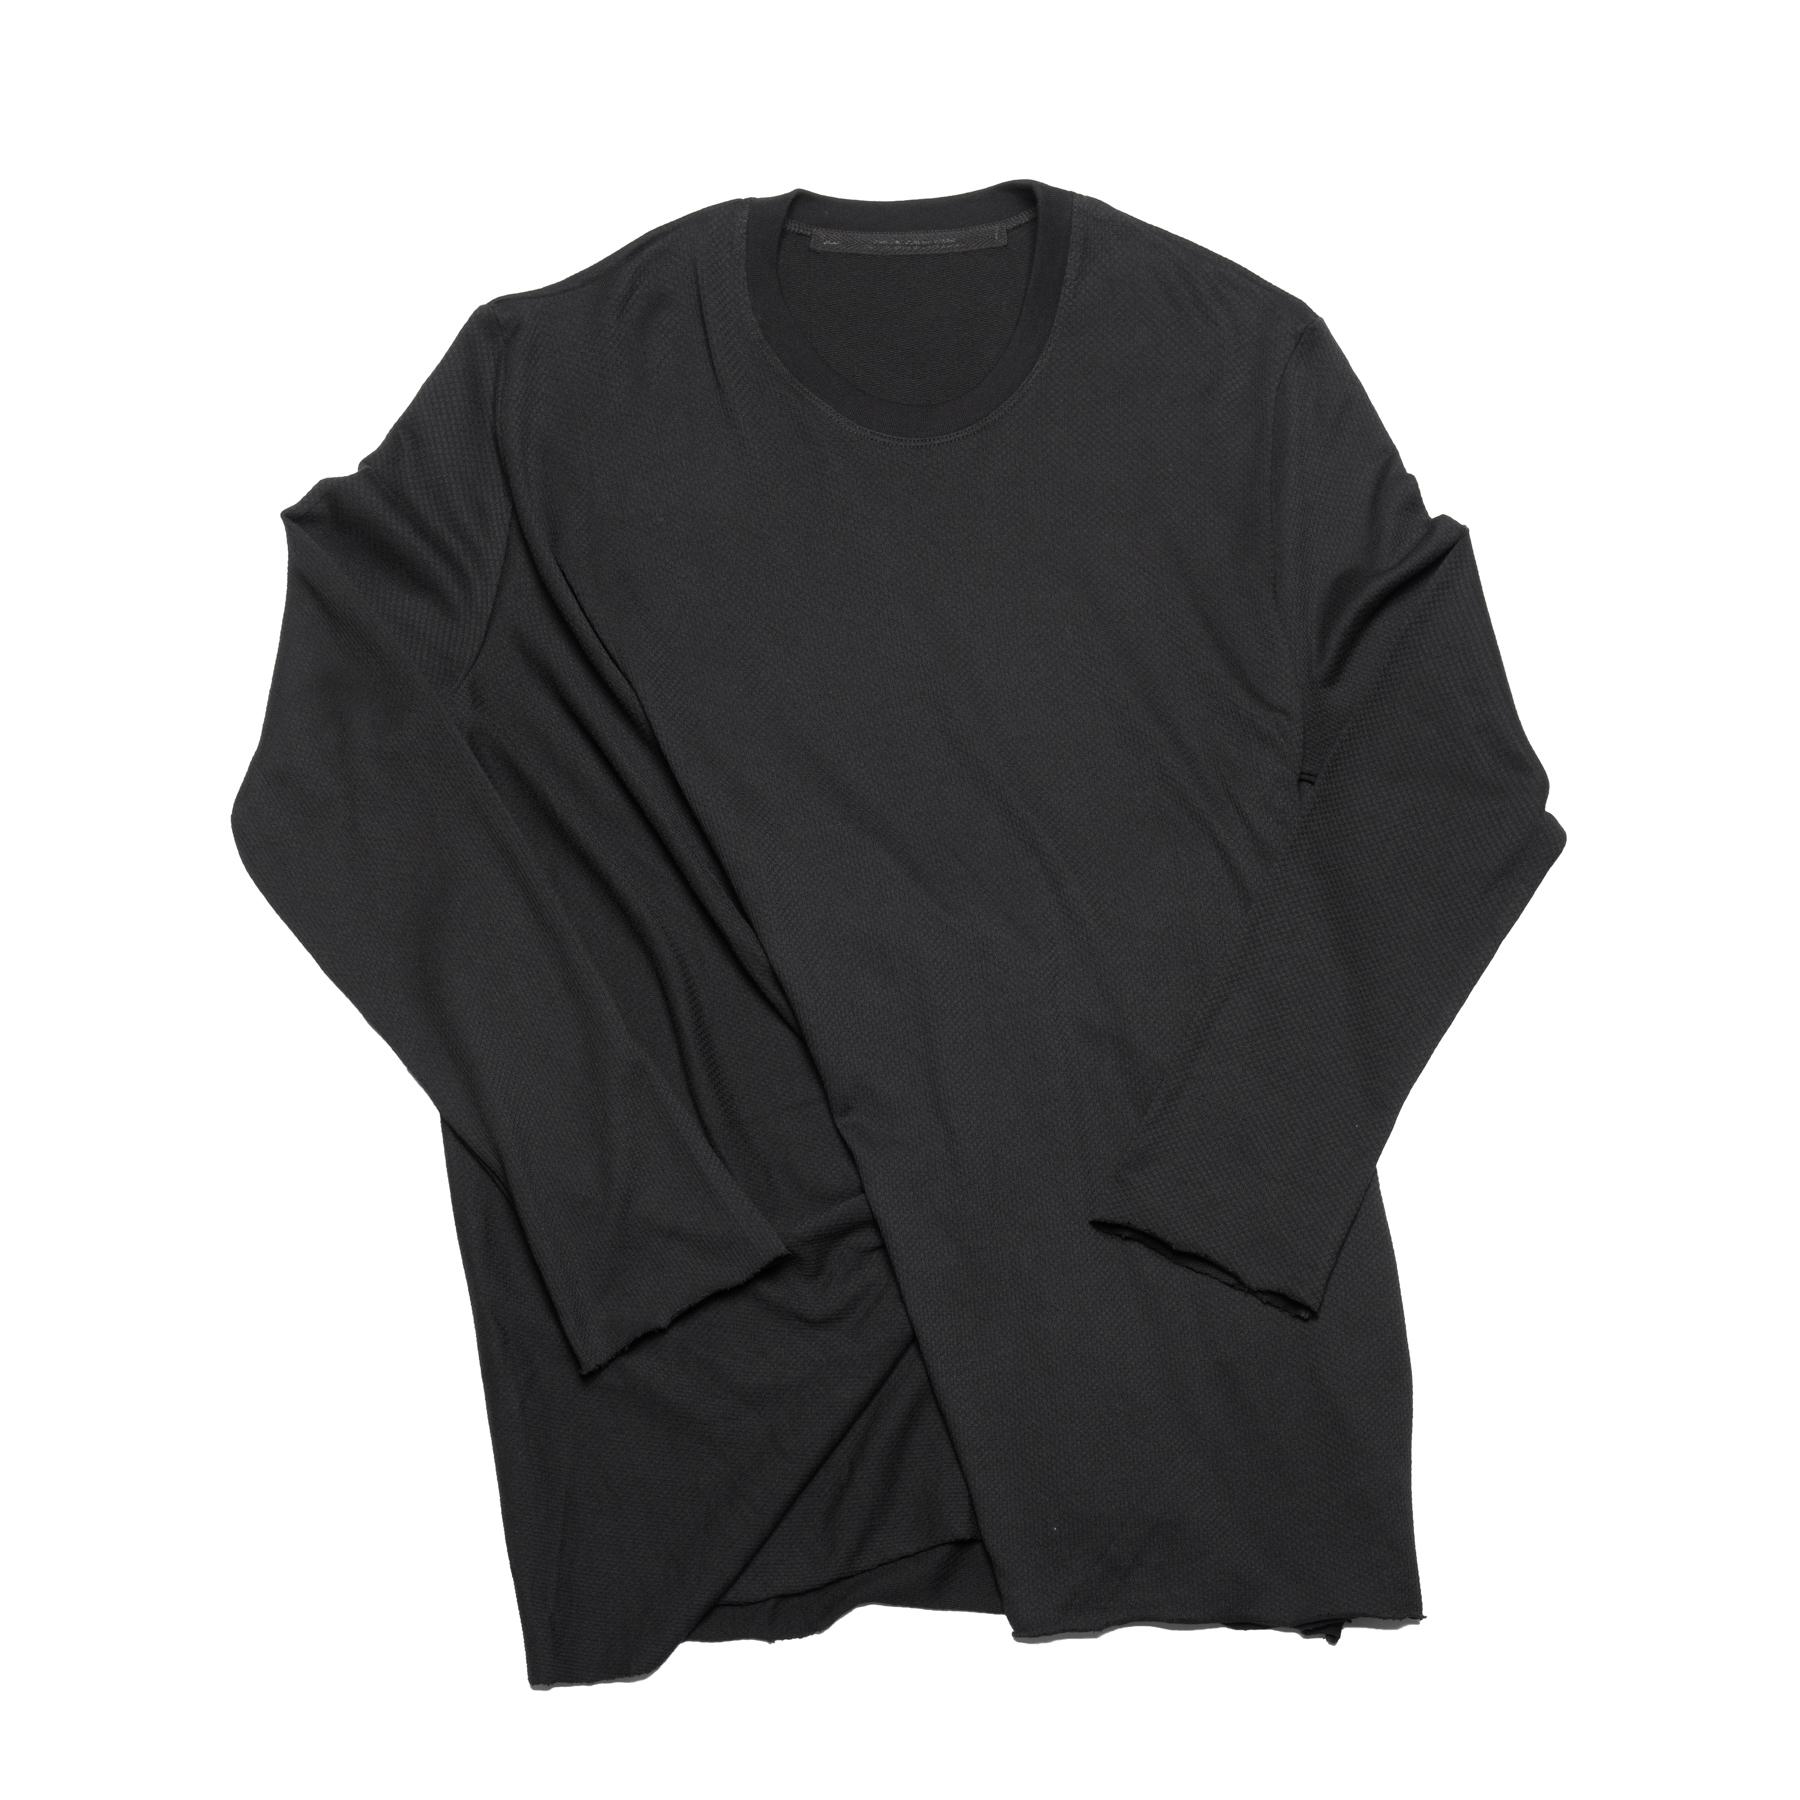 637CUM21-BLACK / シャーリング ロングスリーブ T-シャツ